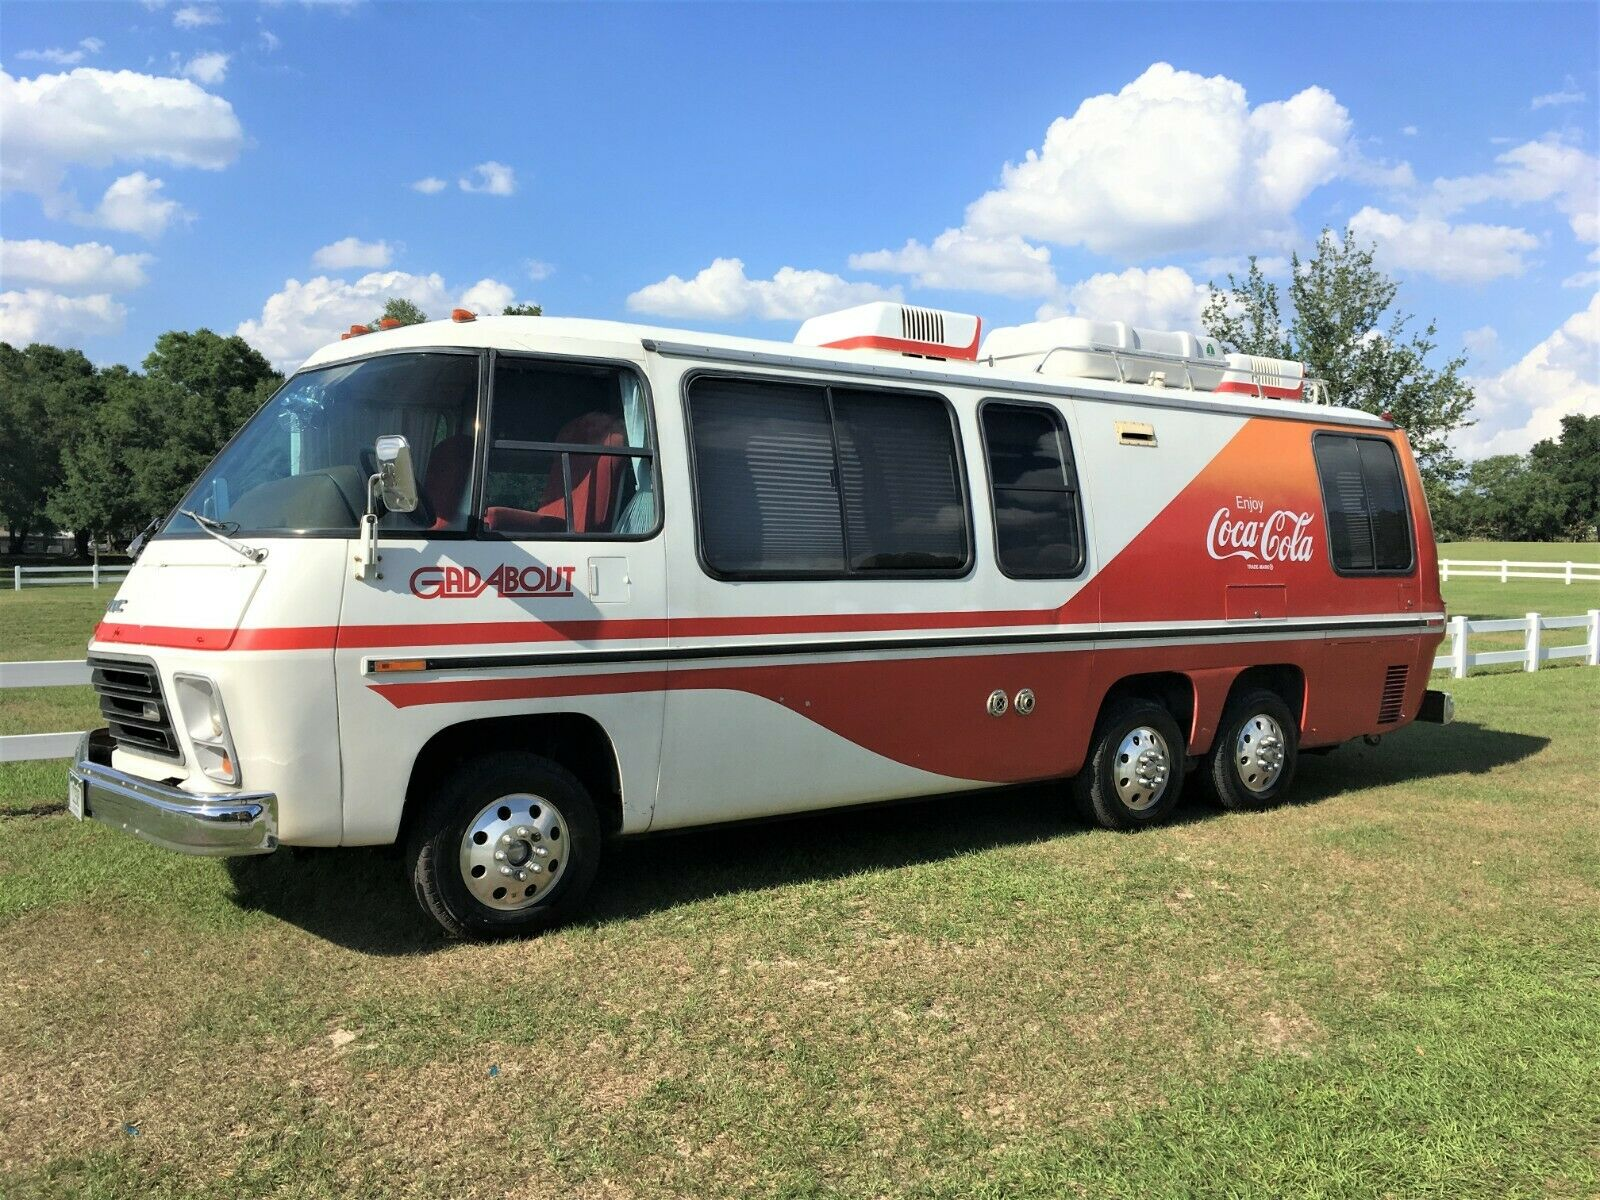 fully restored 1978 GMC Coca Cola Gadabout camper for sale